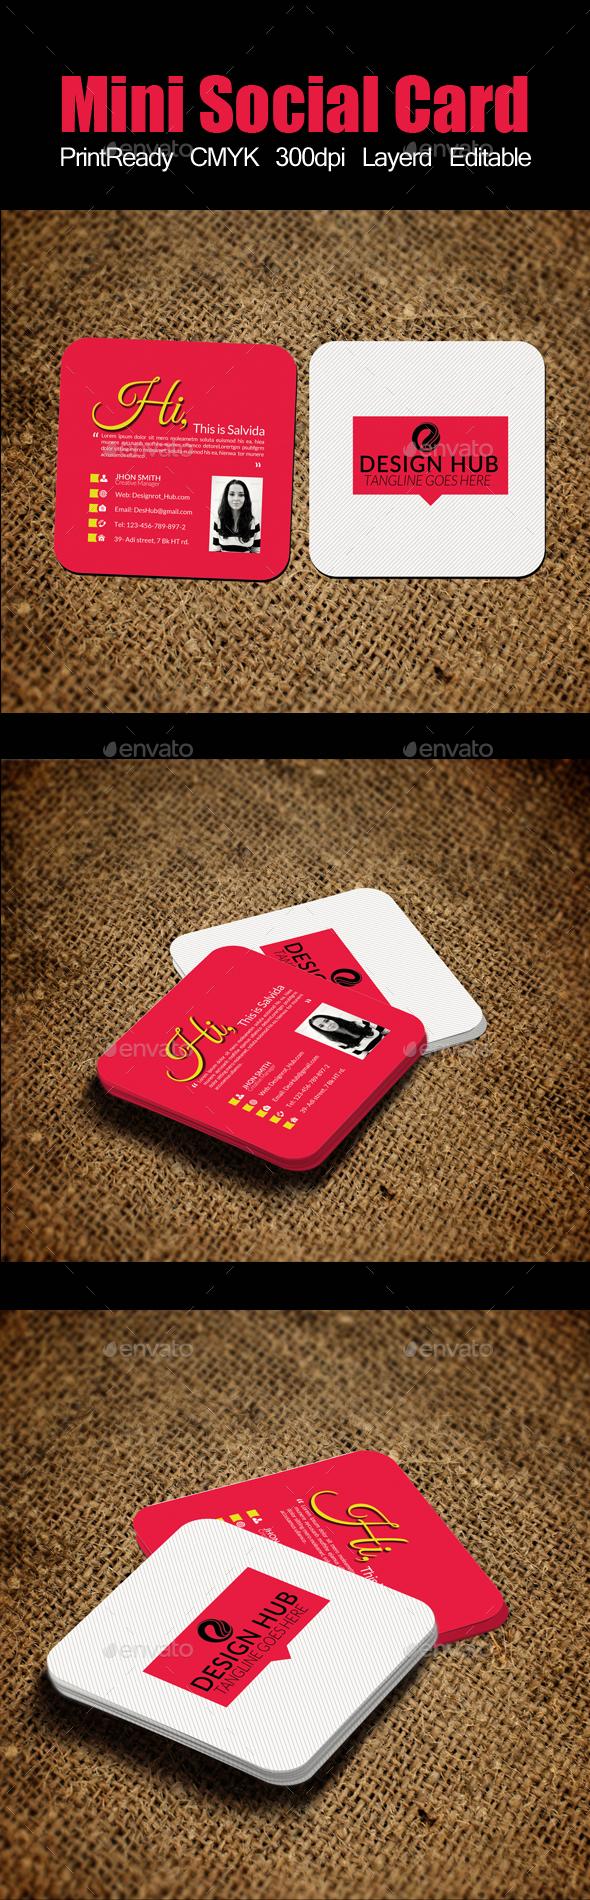 Mini Social Card Template